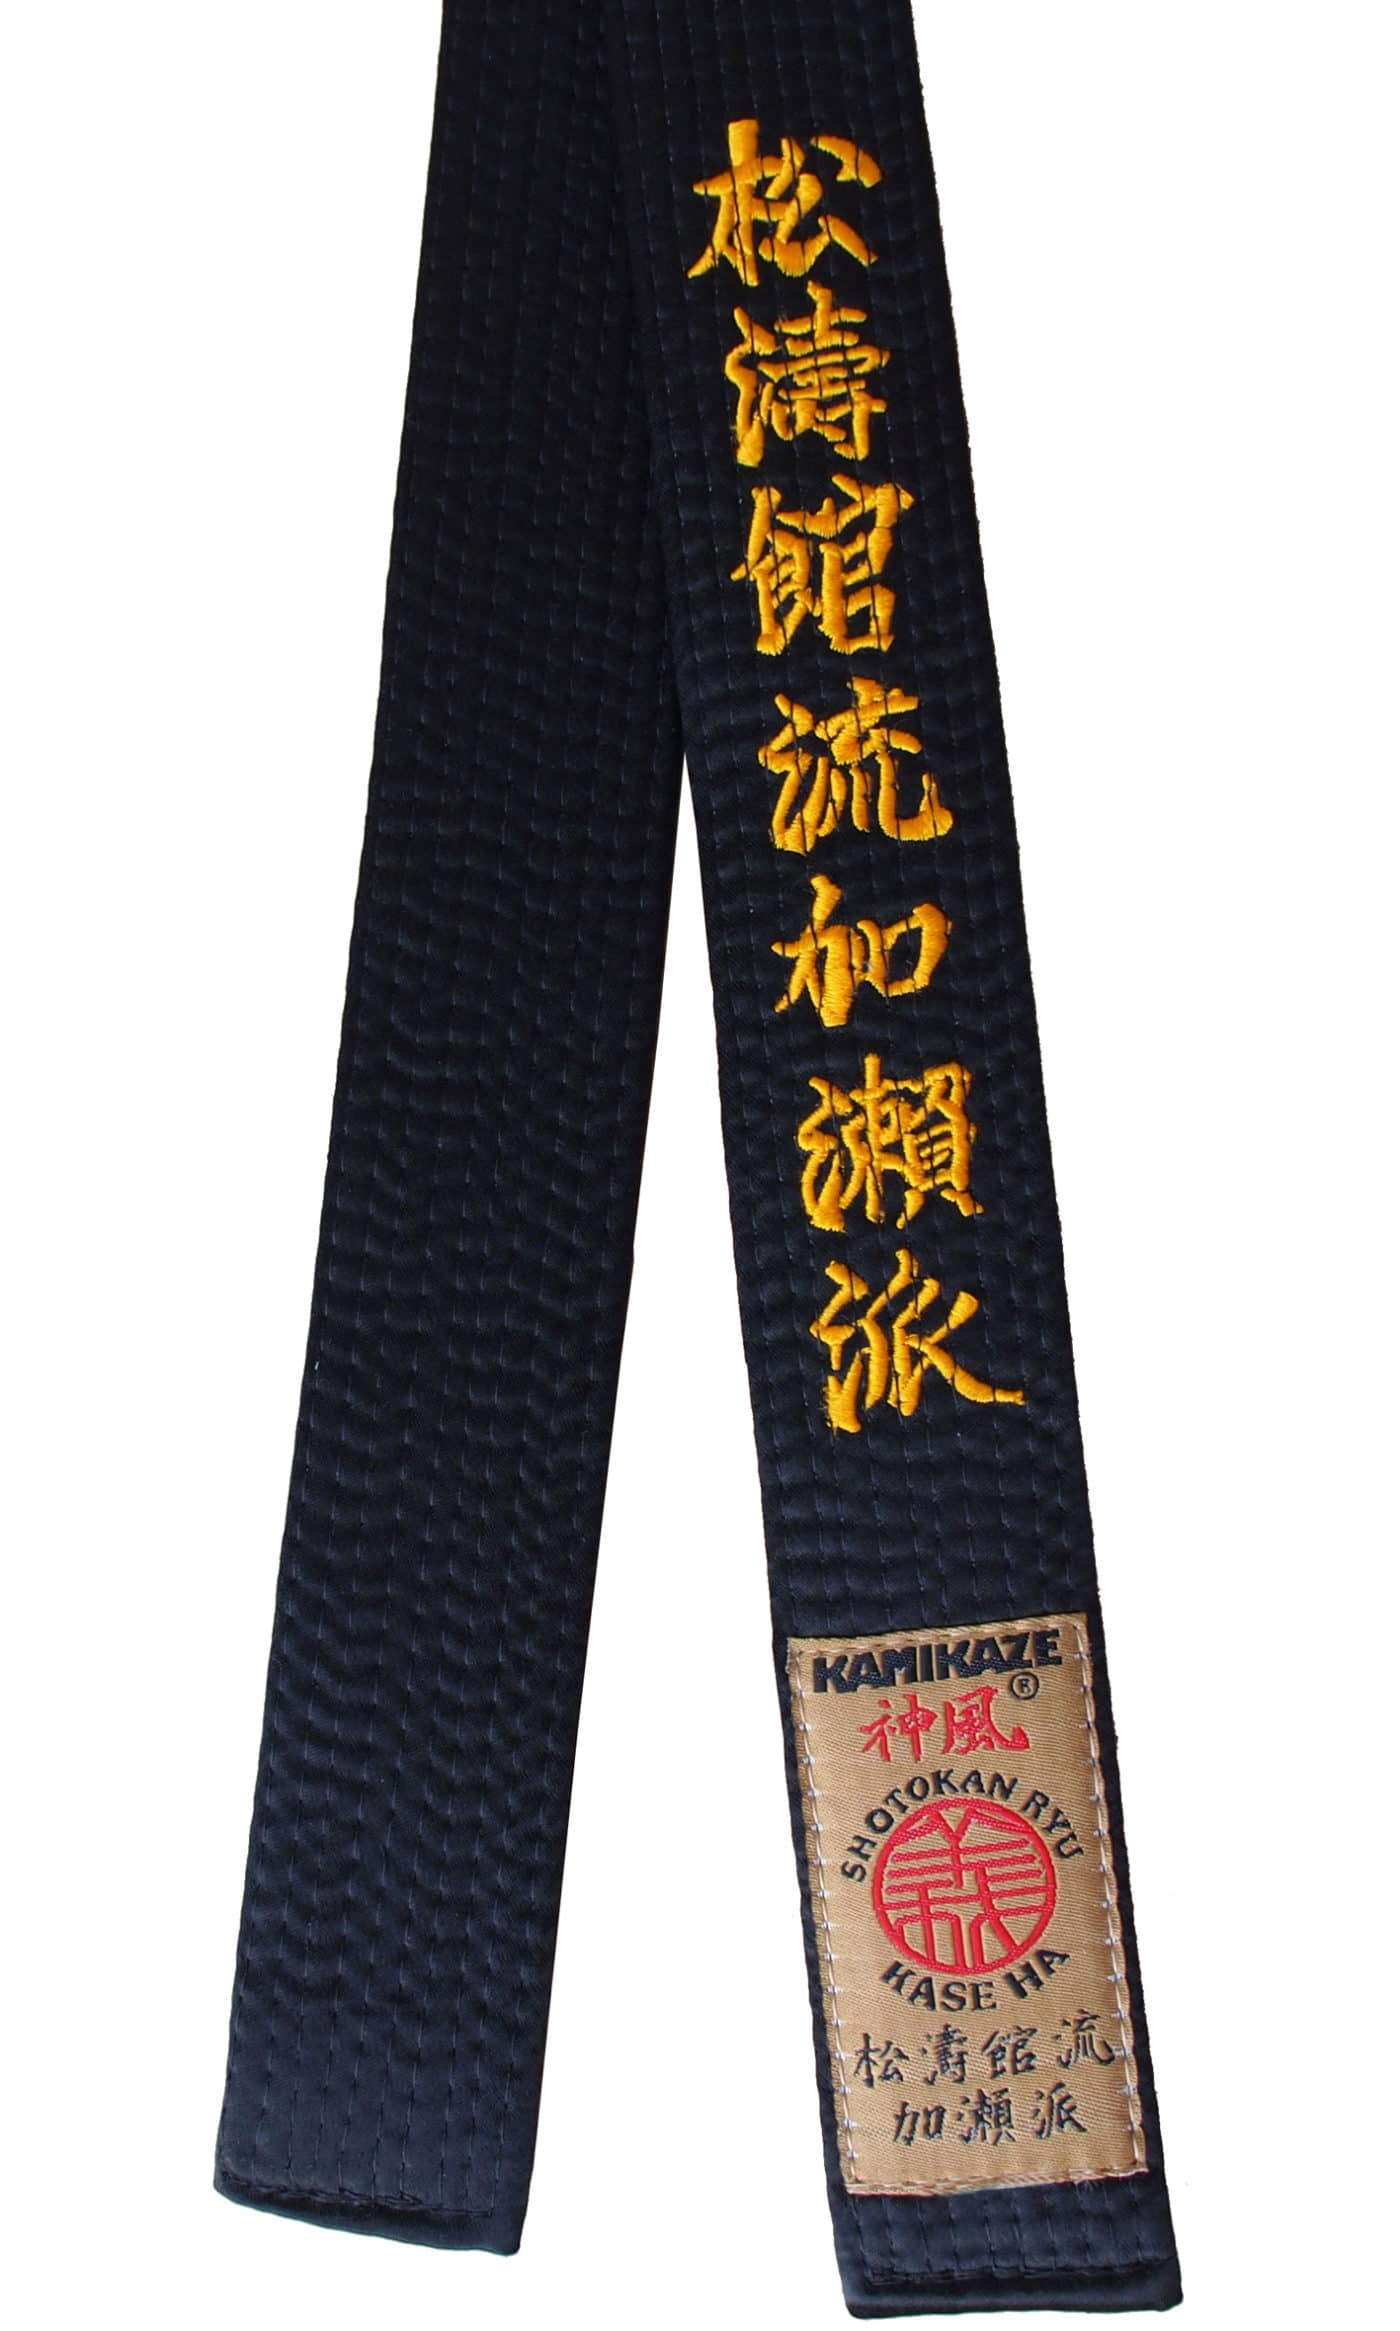 a9825d54665e Ceinture Noire de Karate KAMIKAZE Spéciale SHOTOKAN RYU KASE HA ...